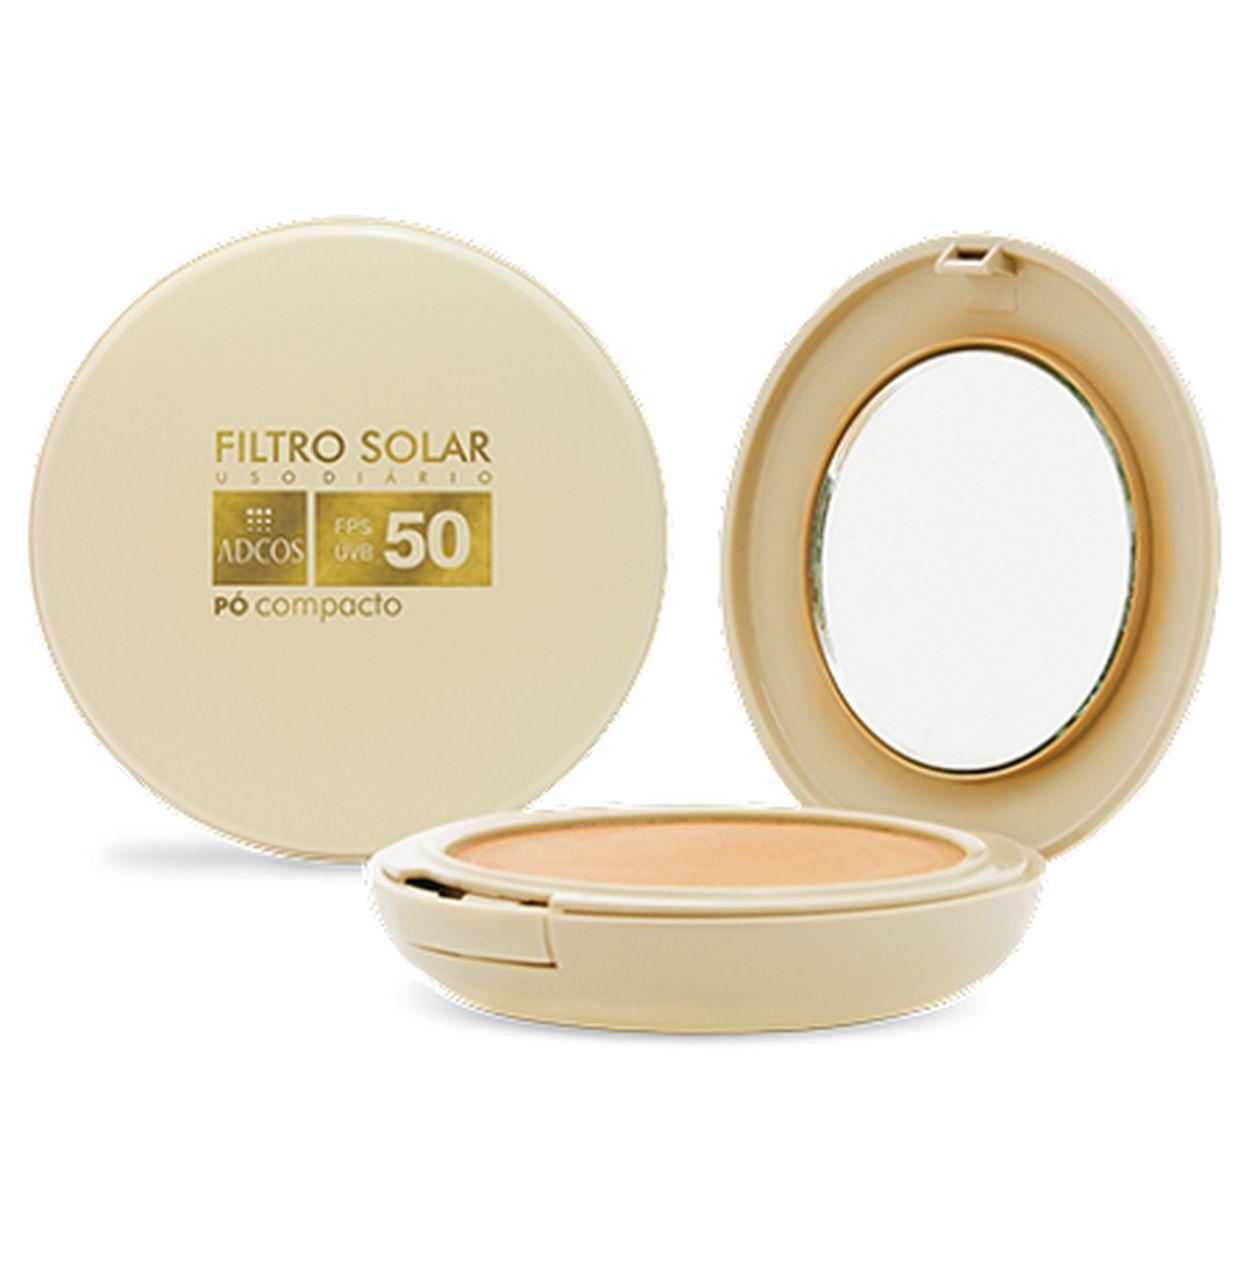 Adcos Filtro Solar Tonalizante Pó Compacto FPS 50 - 11g